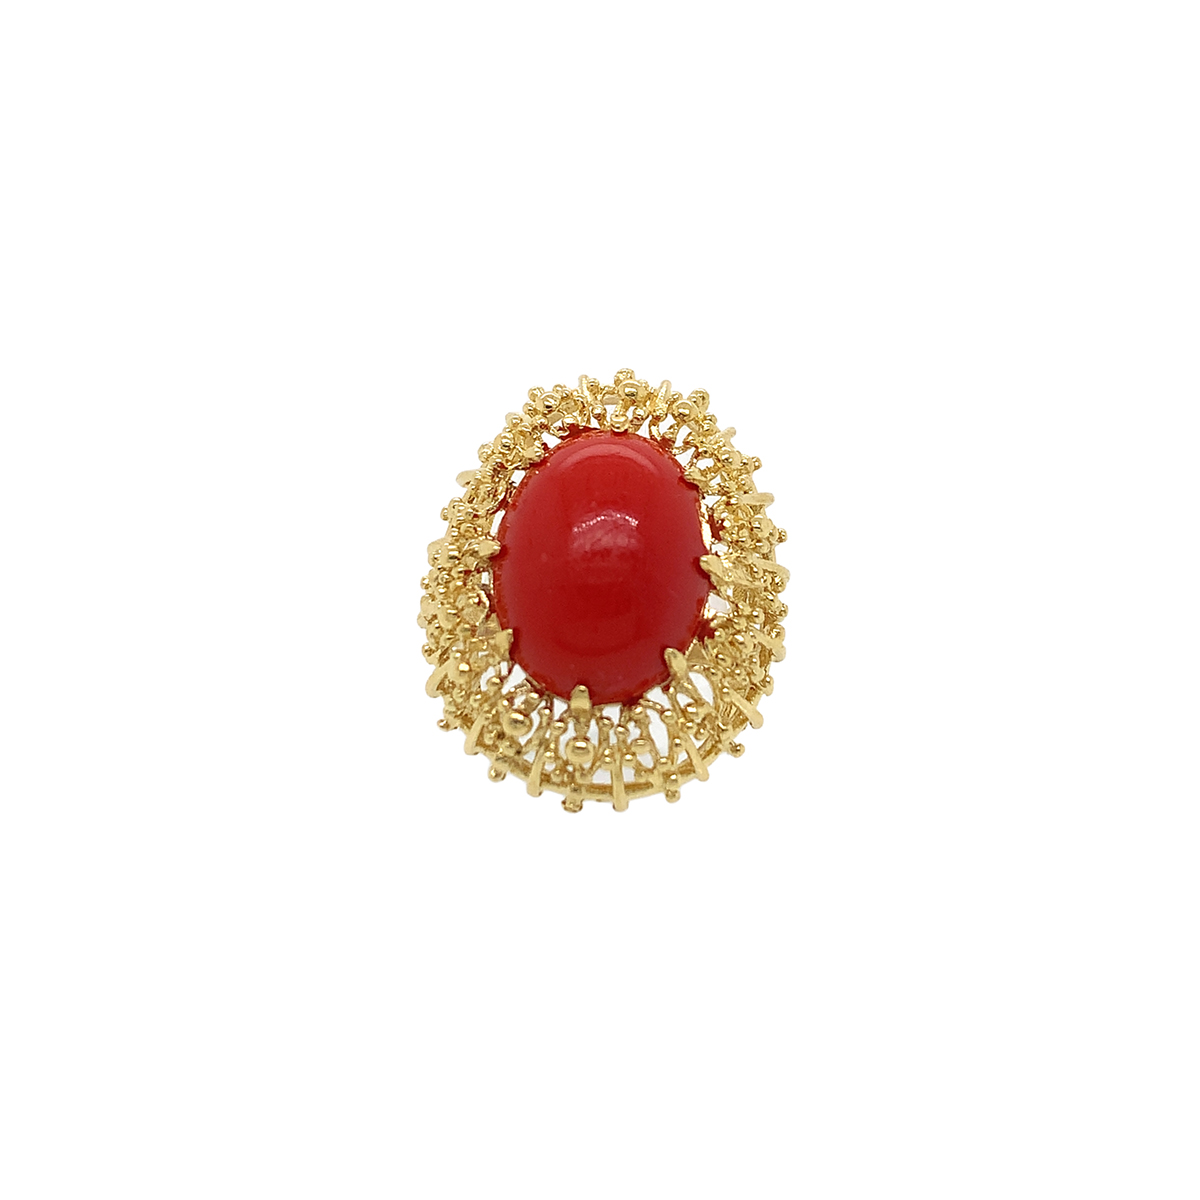 Vintage Ox Blood Coral Domed Ring